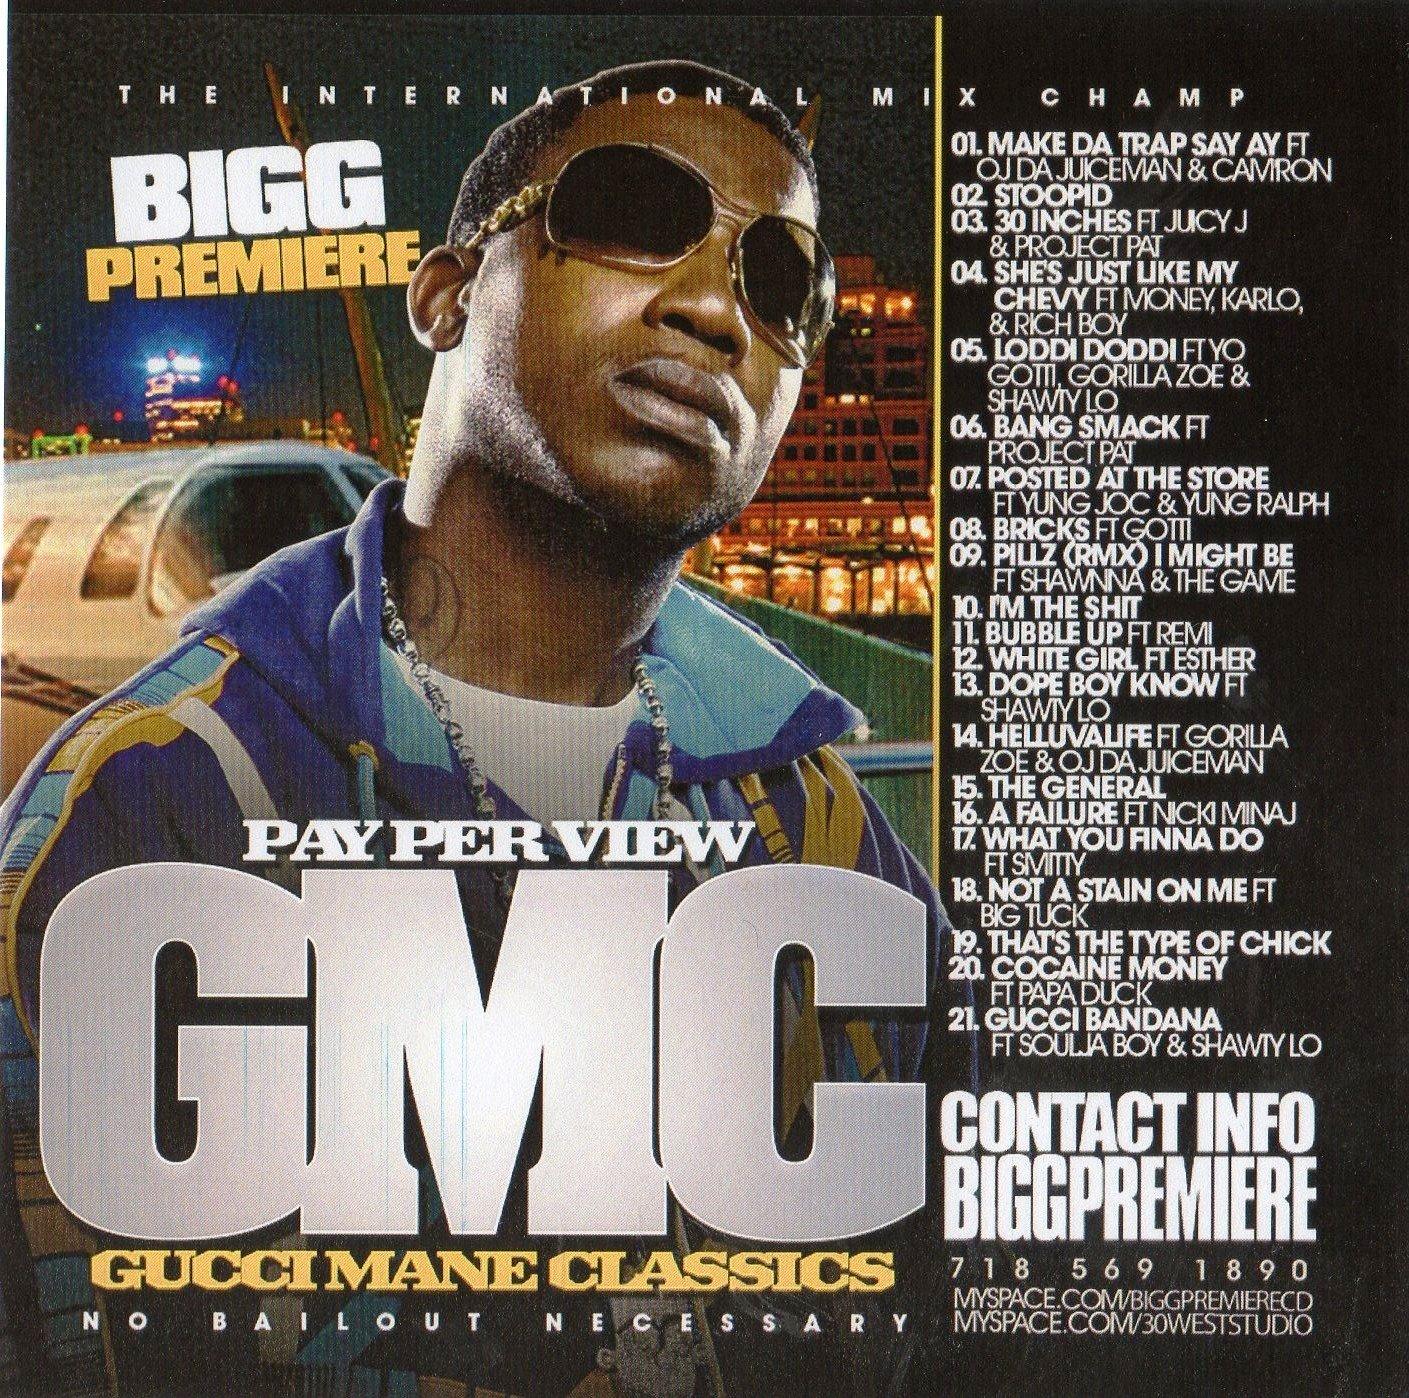 [00_Bigg_Premiere_Presents_Gucci_Mane_Classics-2009.jpg]